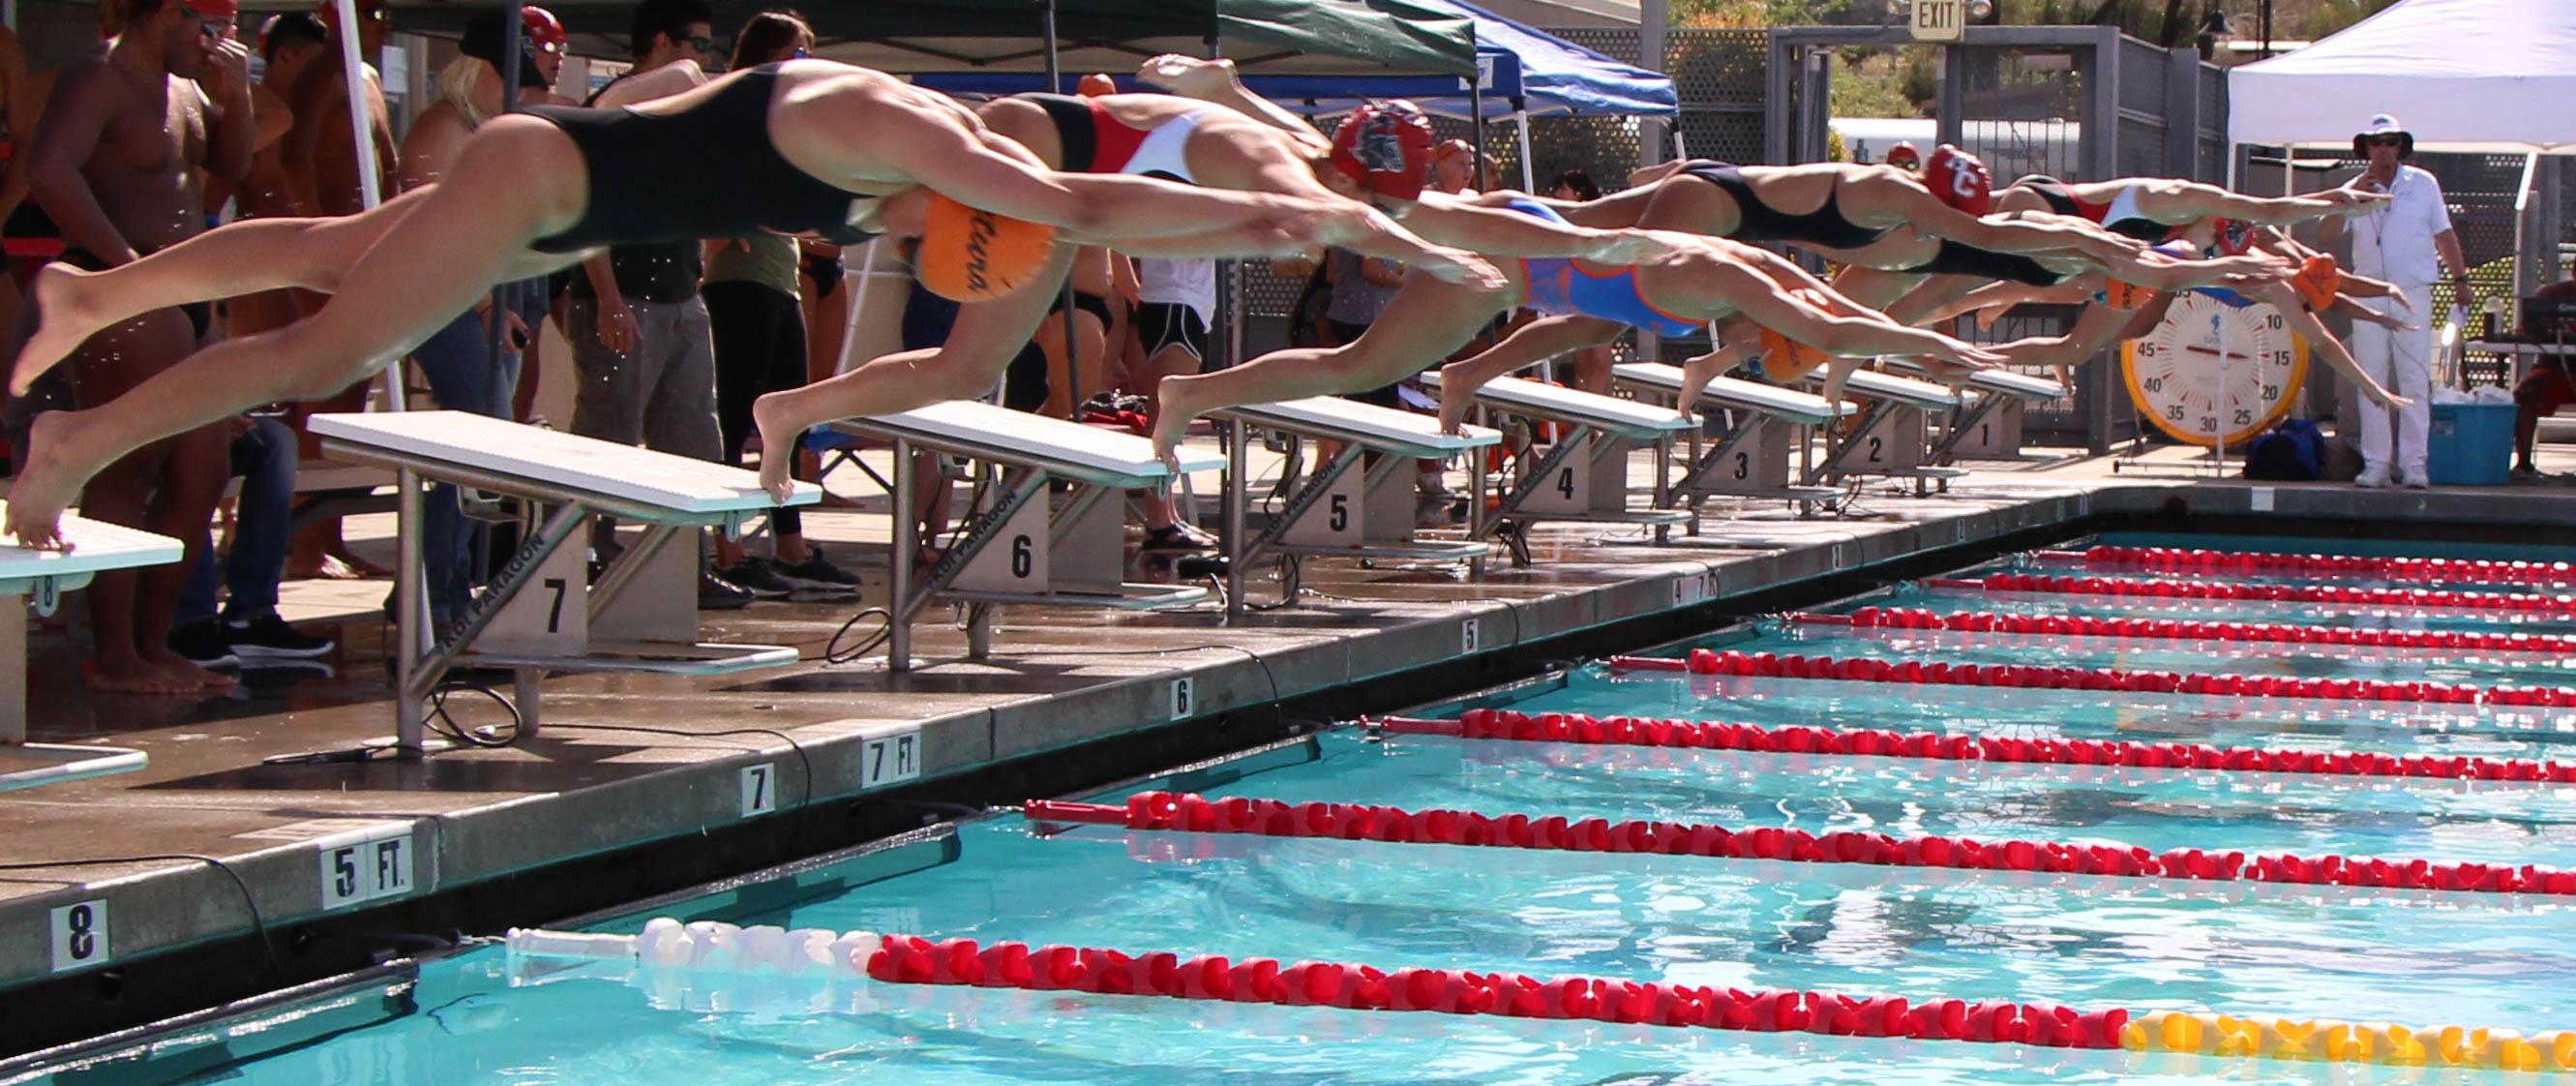 Making a splash toward the finish line